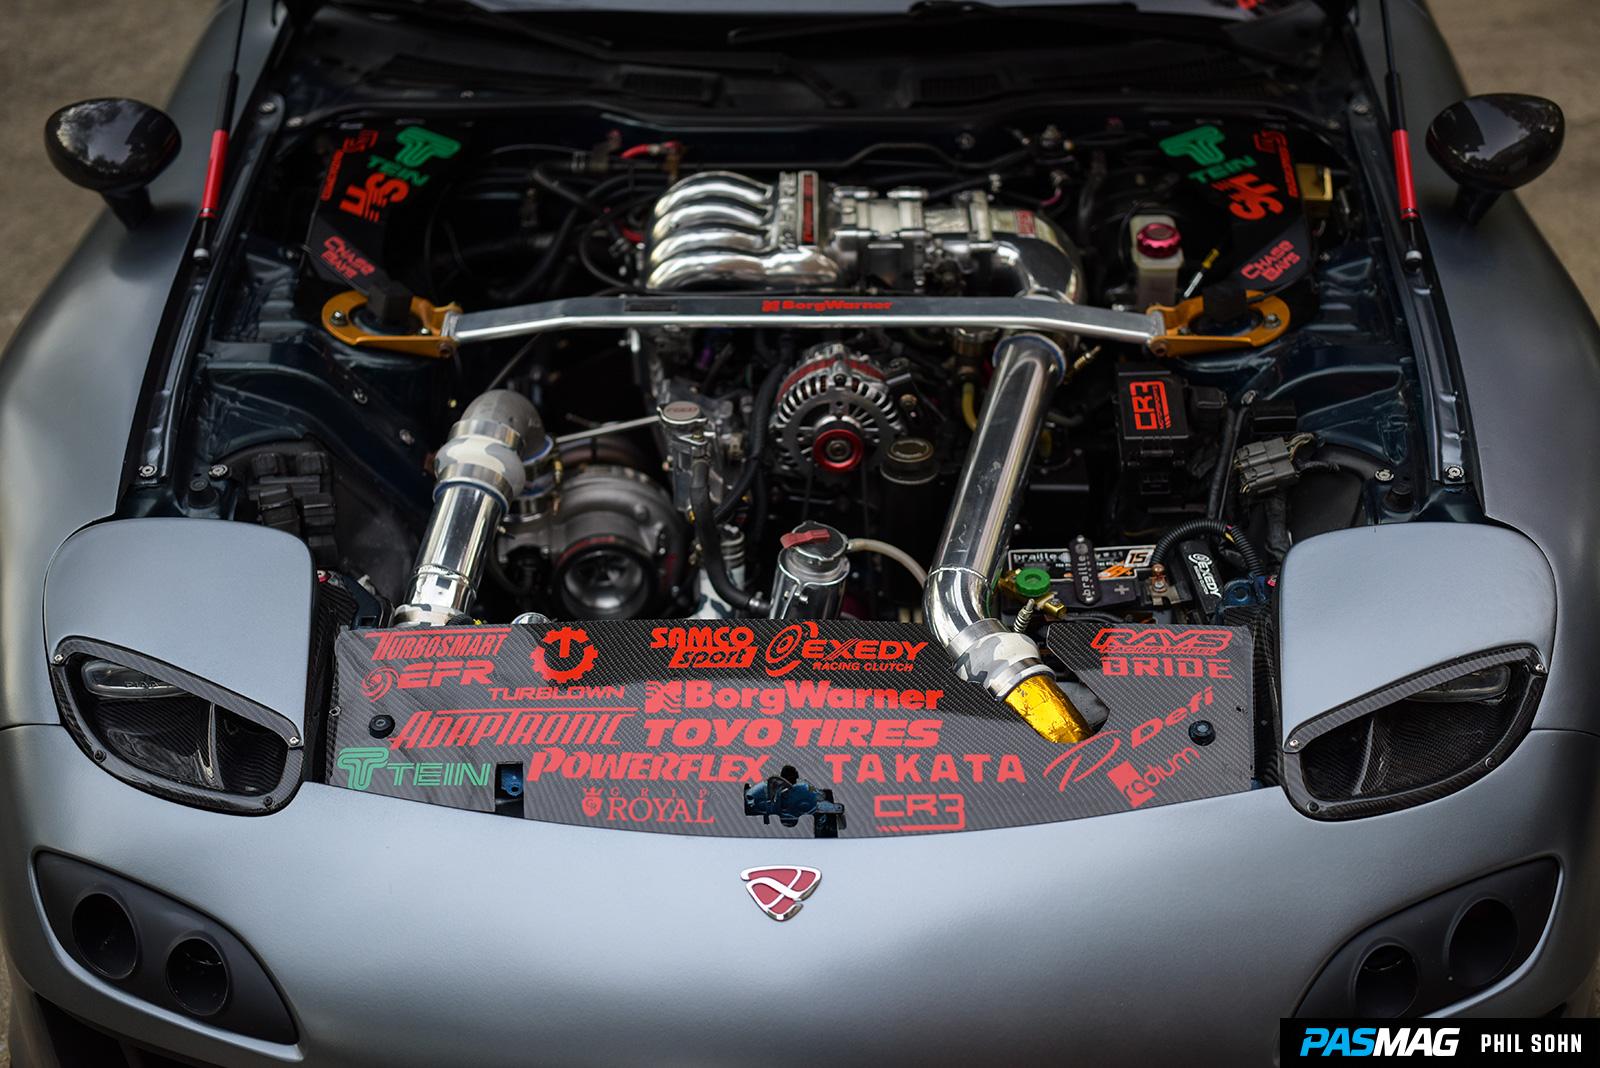 PASMAG | PERFORMANCE AUTO AND SOUND - Rotary Frankenstein ... on 93 mazda rotary engine motor, 93 mazda logo, 93 mazda mpv, 93 mazda mx 5, 93 mazda protege, 93 mazda mx6, 93 mazda prelude, 93 mazda miata, 93 mazda 240sx, 93 mazda mx3, 93 mazda cosmo, 93 mazda truck,